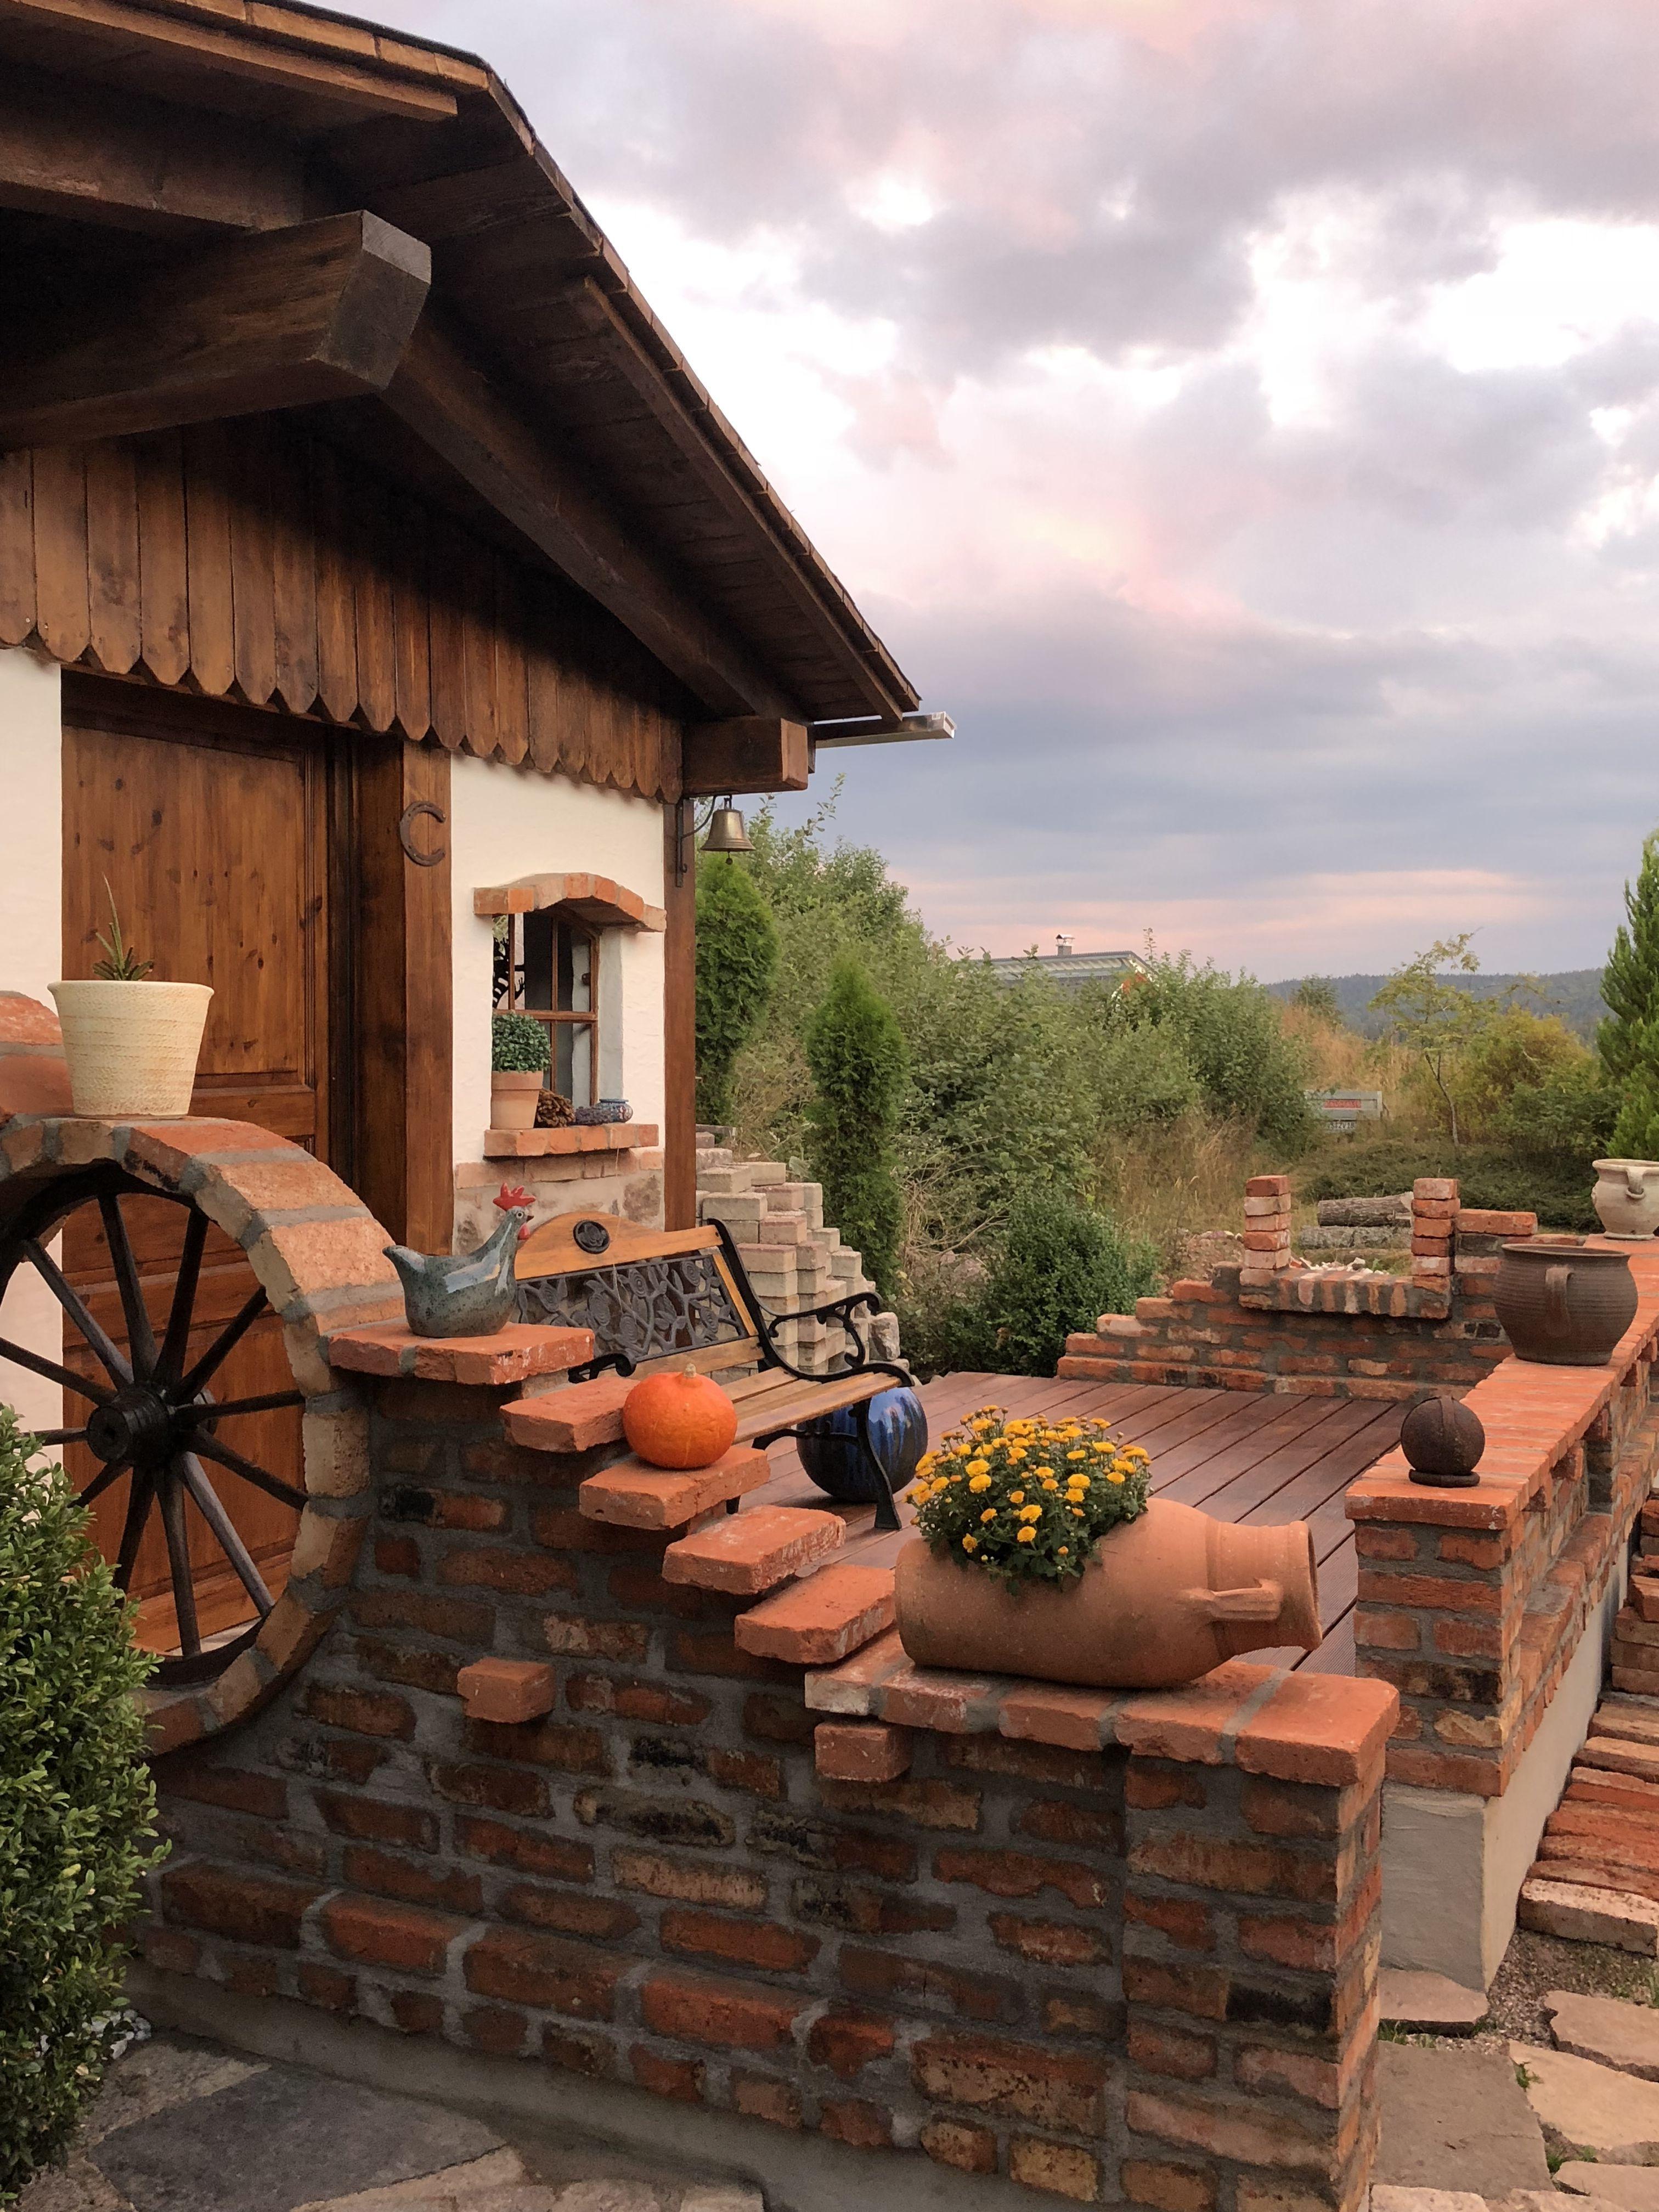 Kreative gartenhausgestaltung gr din pinterest for Jardineria al aire libre casa pendiente